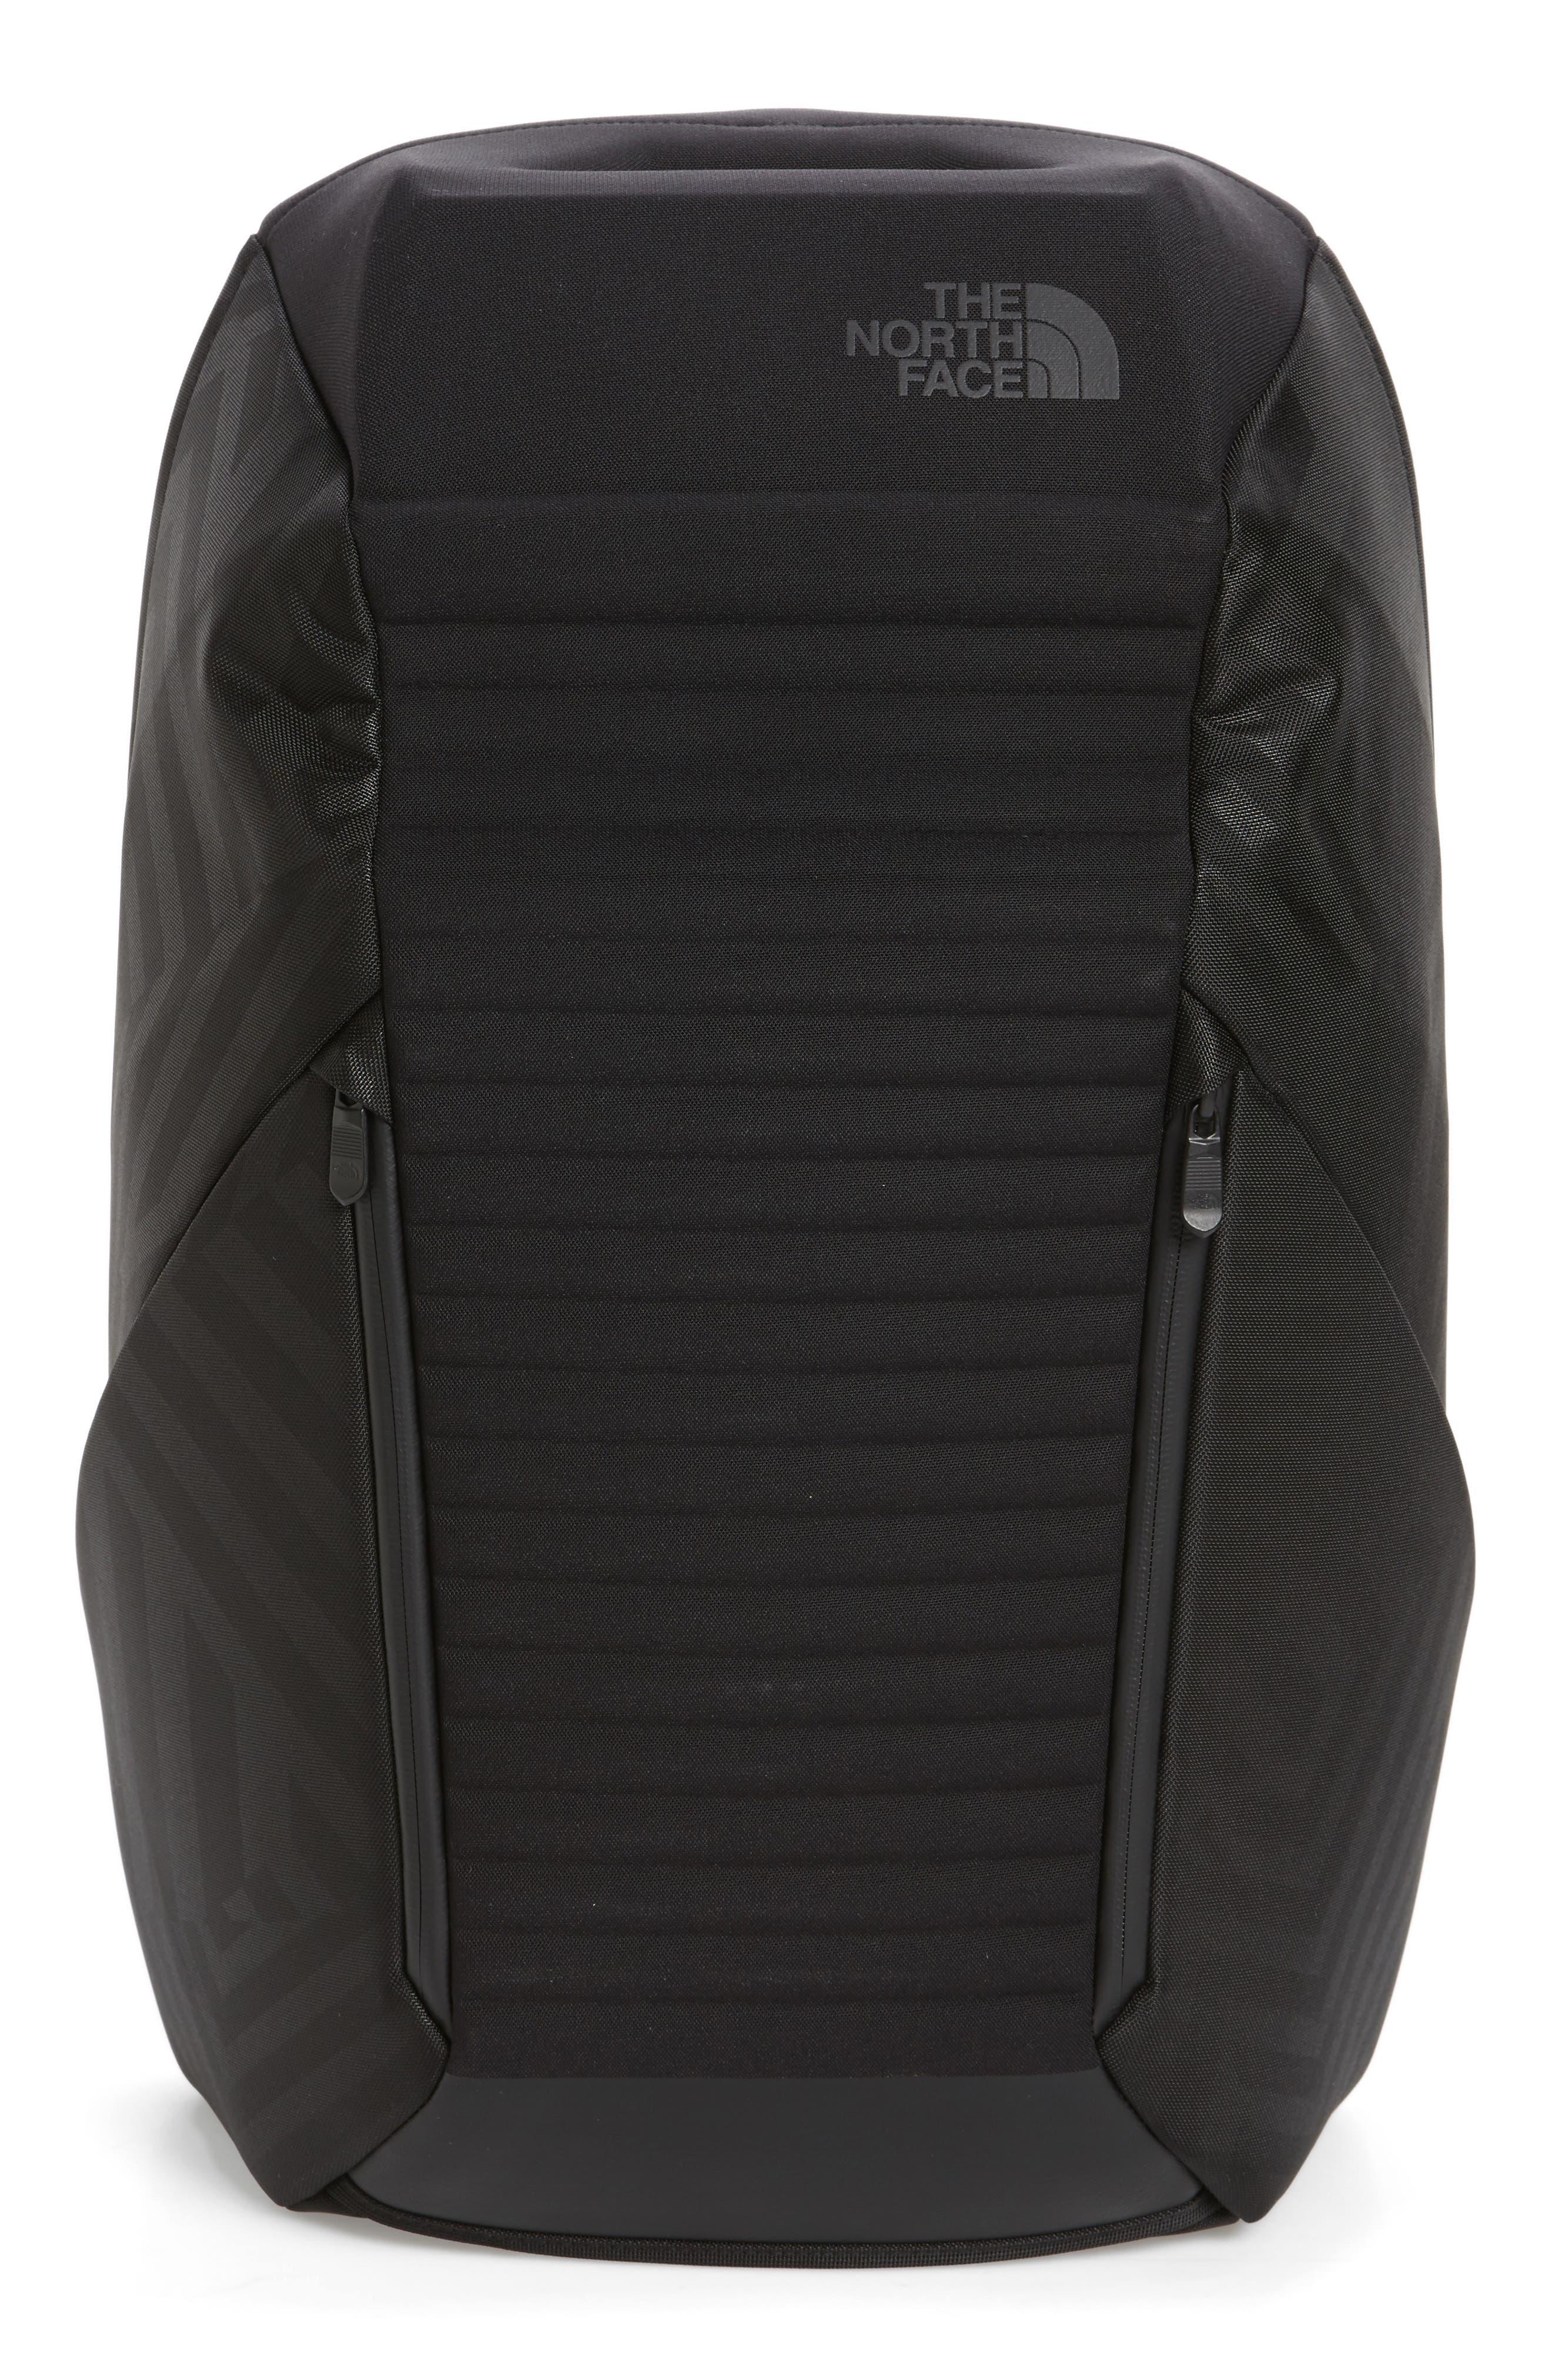 Access Backpack,                             Main thumbnail 1, color,                             Black/ Black